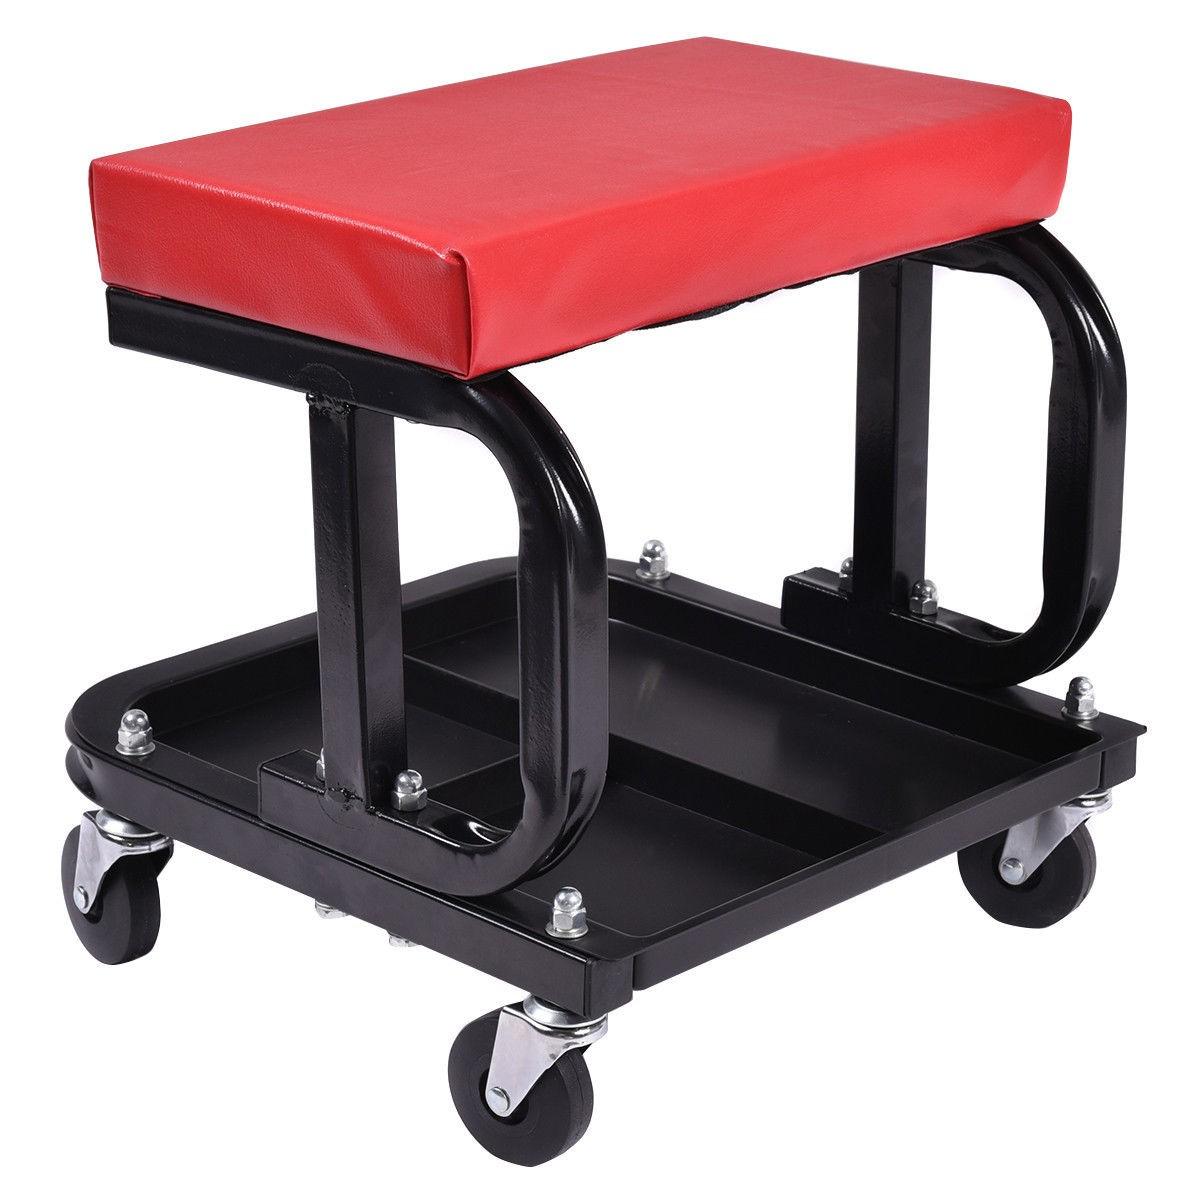 Rolling Creeper Seat Mechanic Stool Chair Repair Tools Tray Shop Auto Car Garage - Walmart.com  sc 1 st  Walmart & Rolling Creeper Seat Mechanic Stool Chair Repair Tools Tray Shop ... islam-shia.org